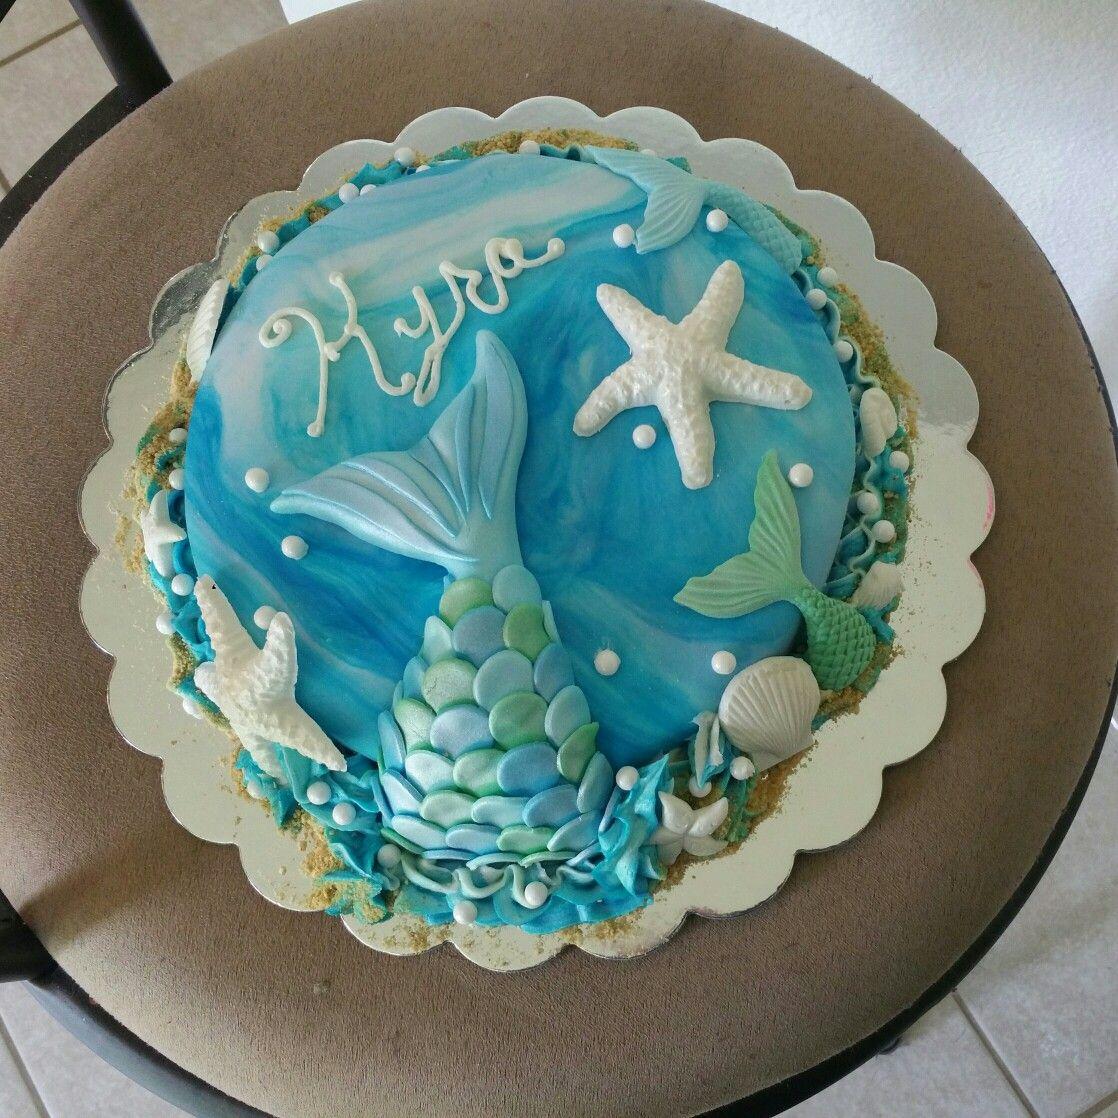 Mermaid cake cake cake decorating mermaid cakes